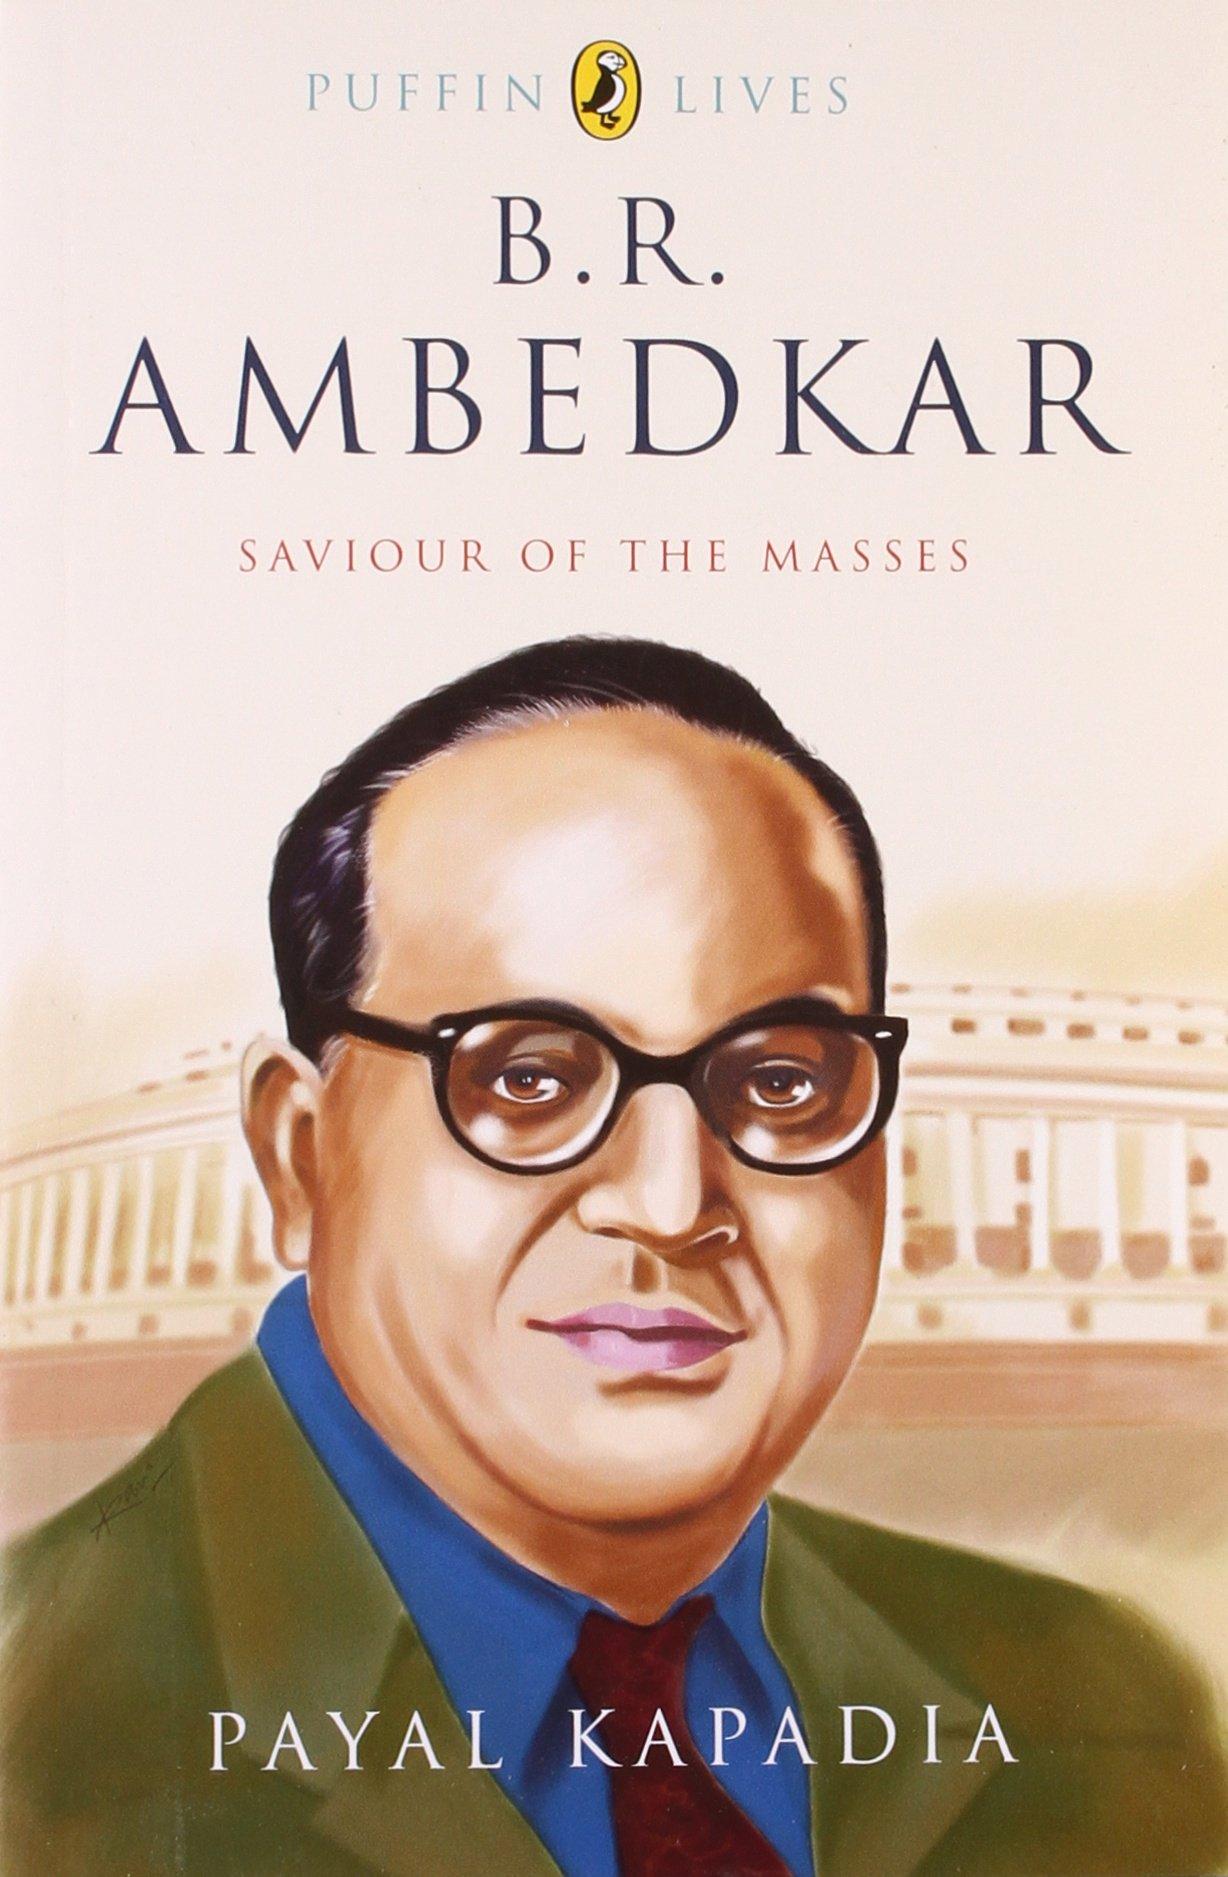 Download Puffin Lives: B.R. Ambedkar, Saviour of the Masses PDF